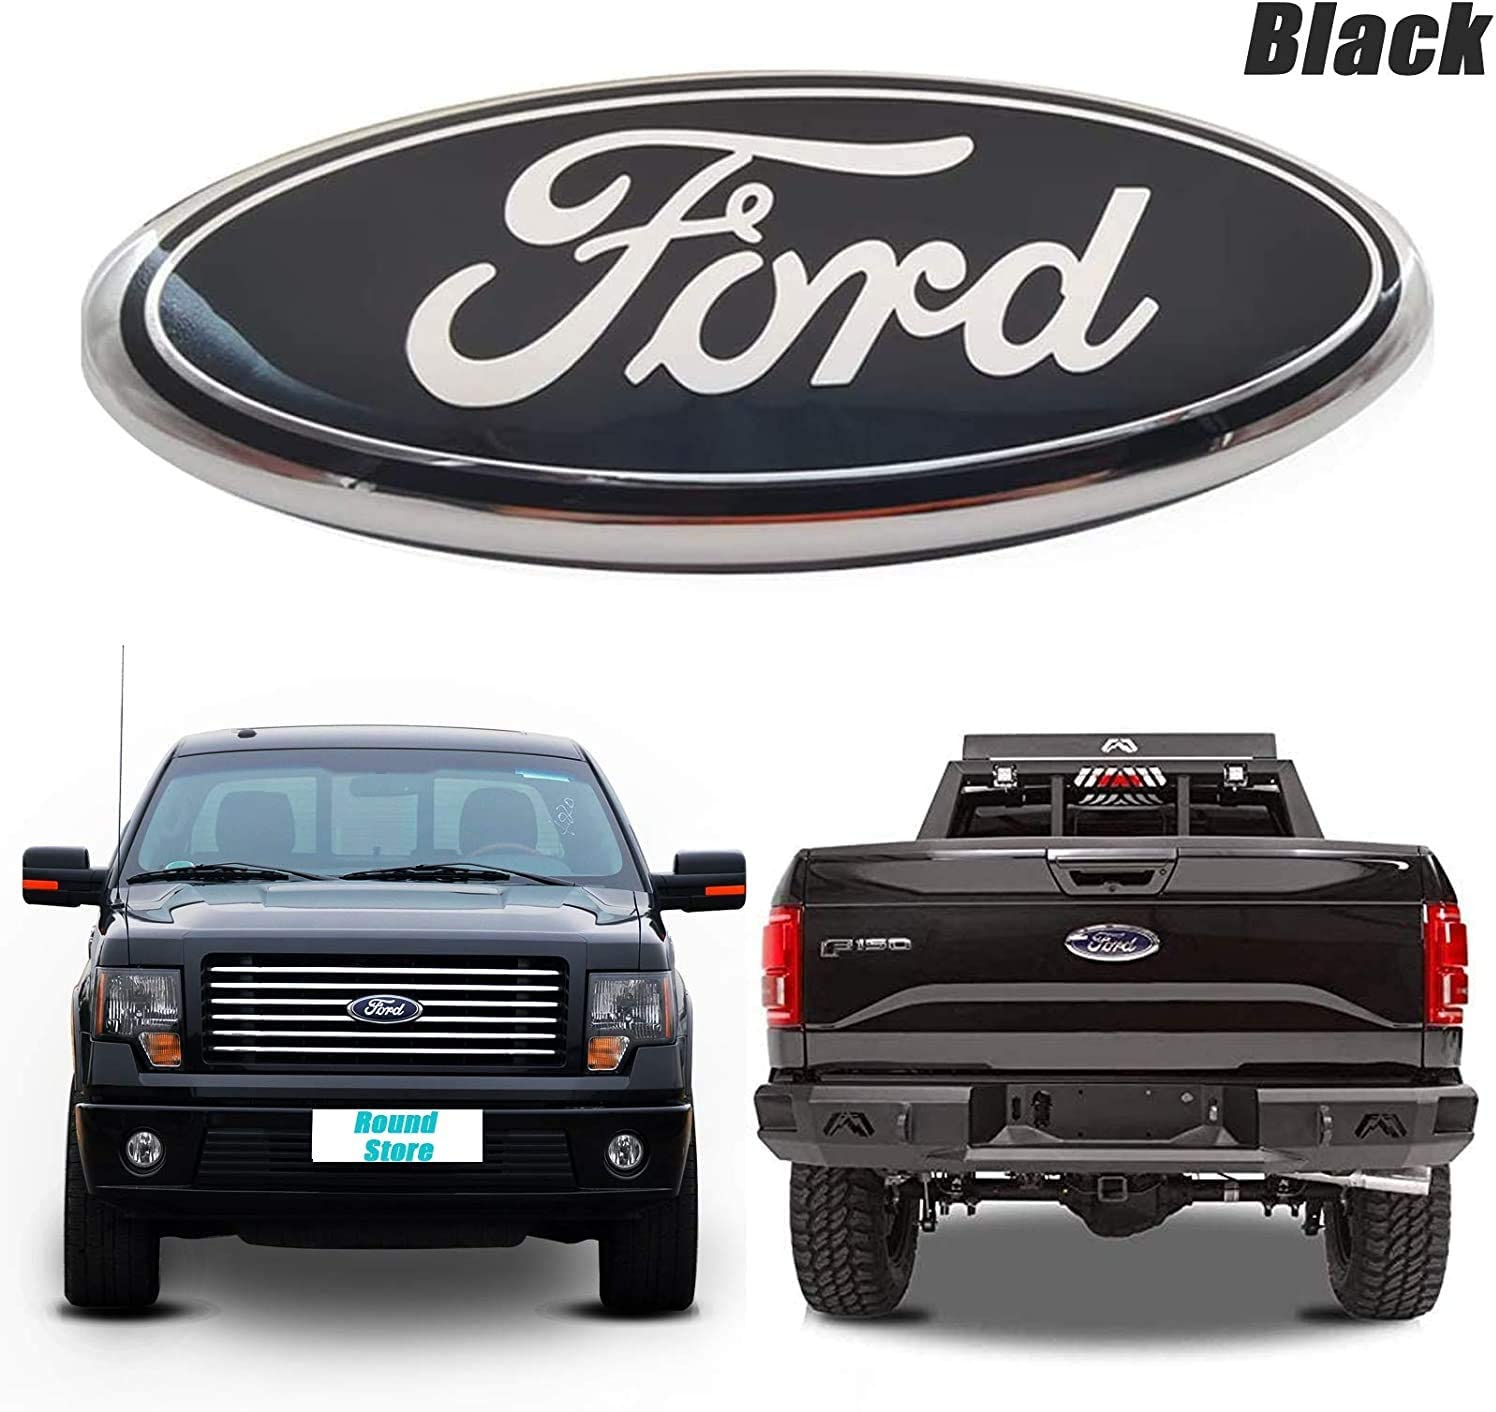 9inch Ford F150 Emblem Front Grille Tailgate Emblem Oval 9